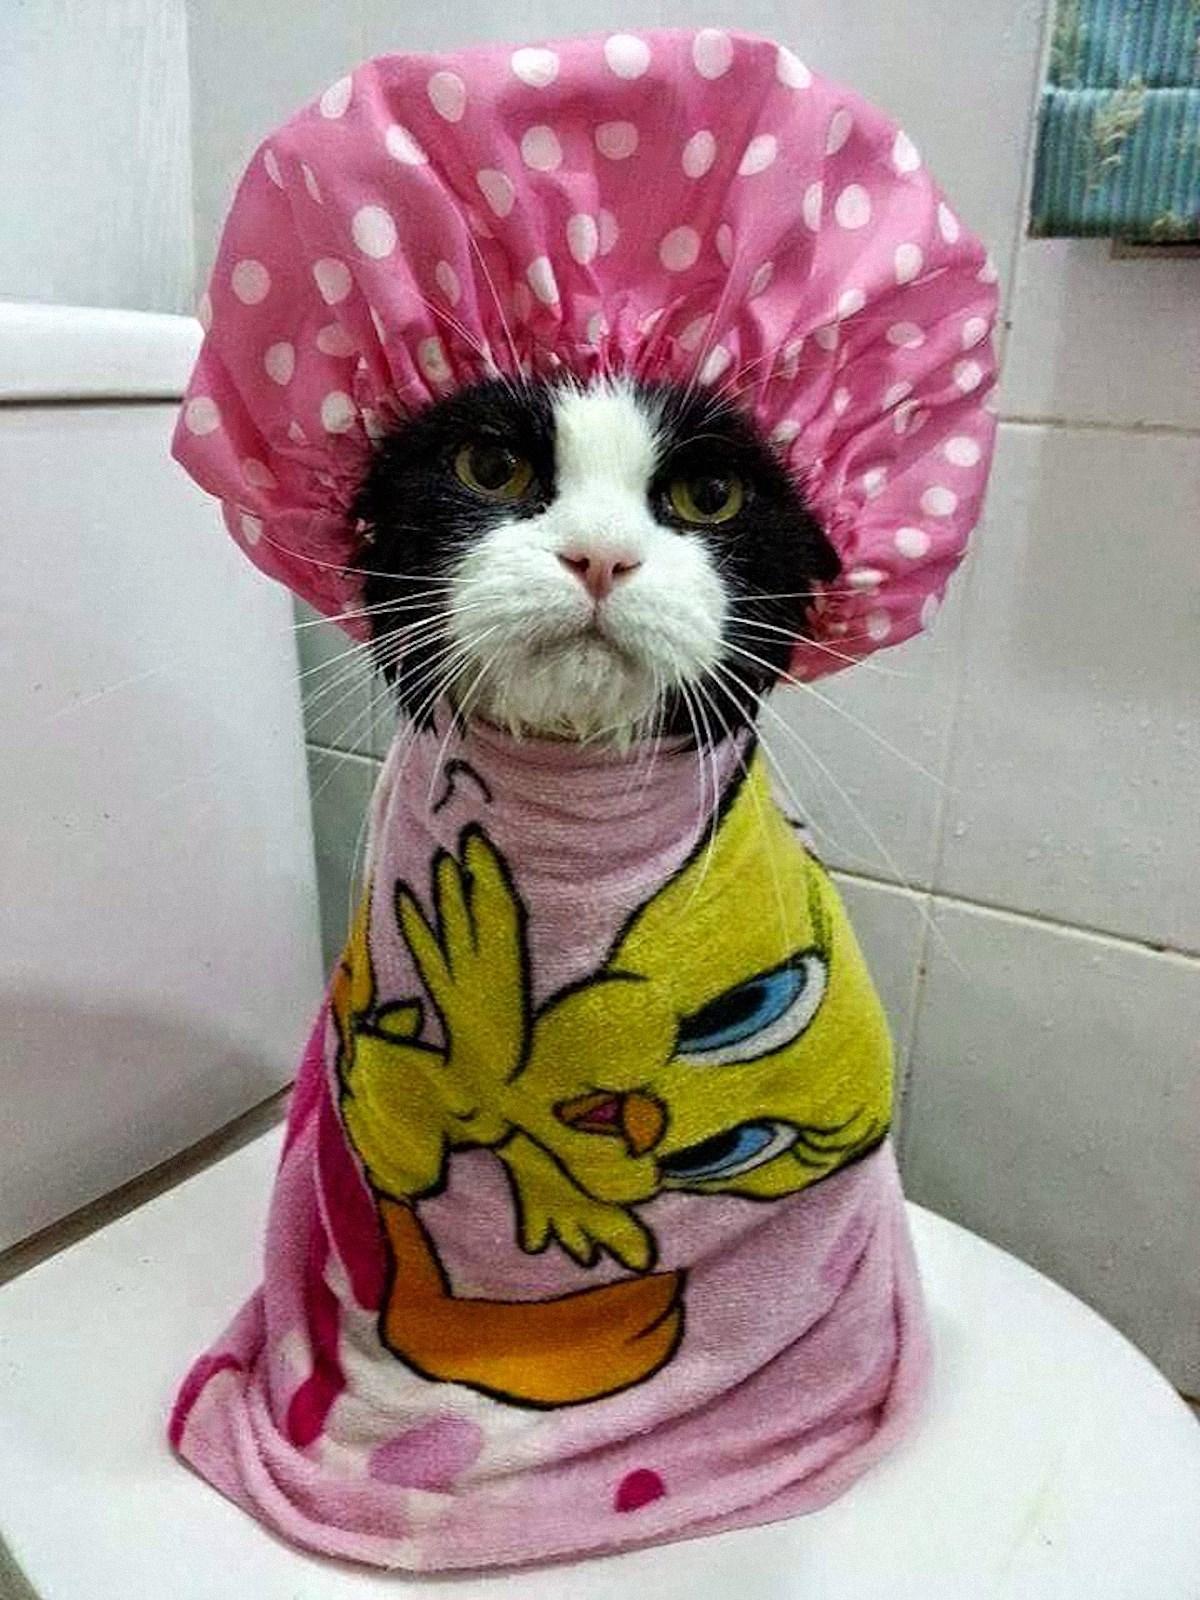 00 animals bath 04. 280715